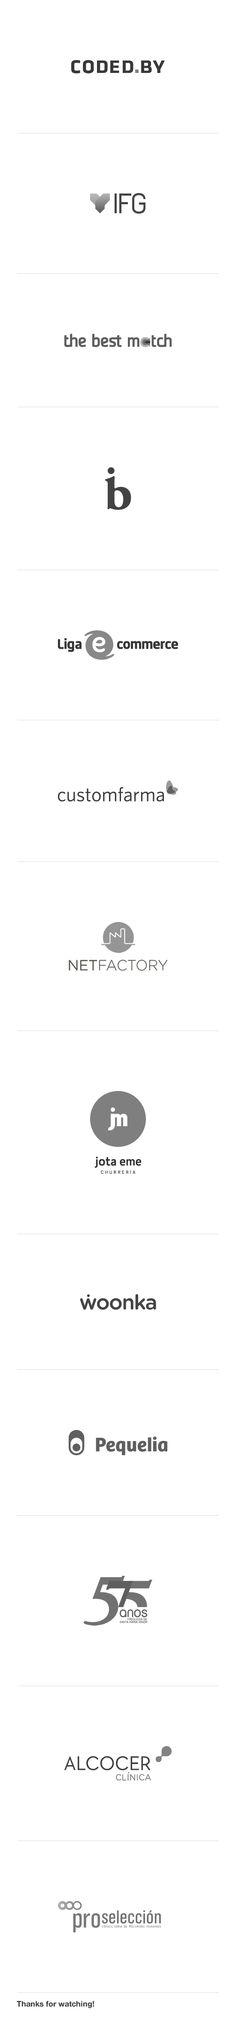 Some logos, by Aditiva Design